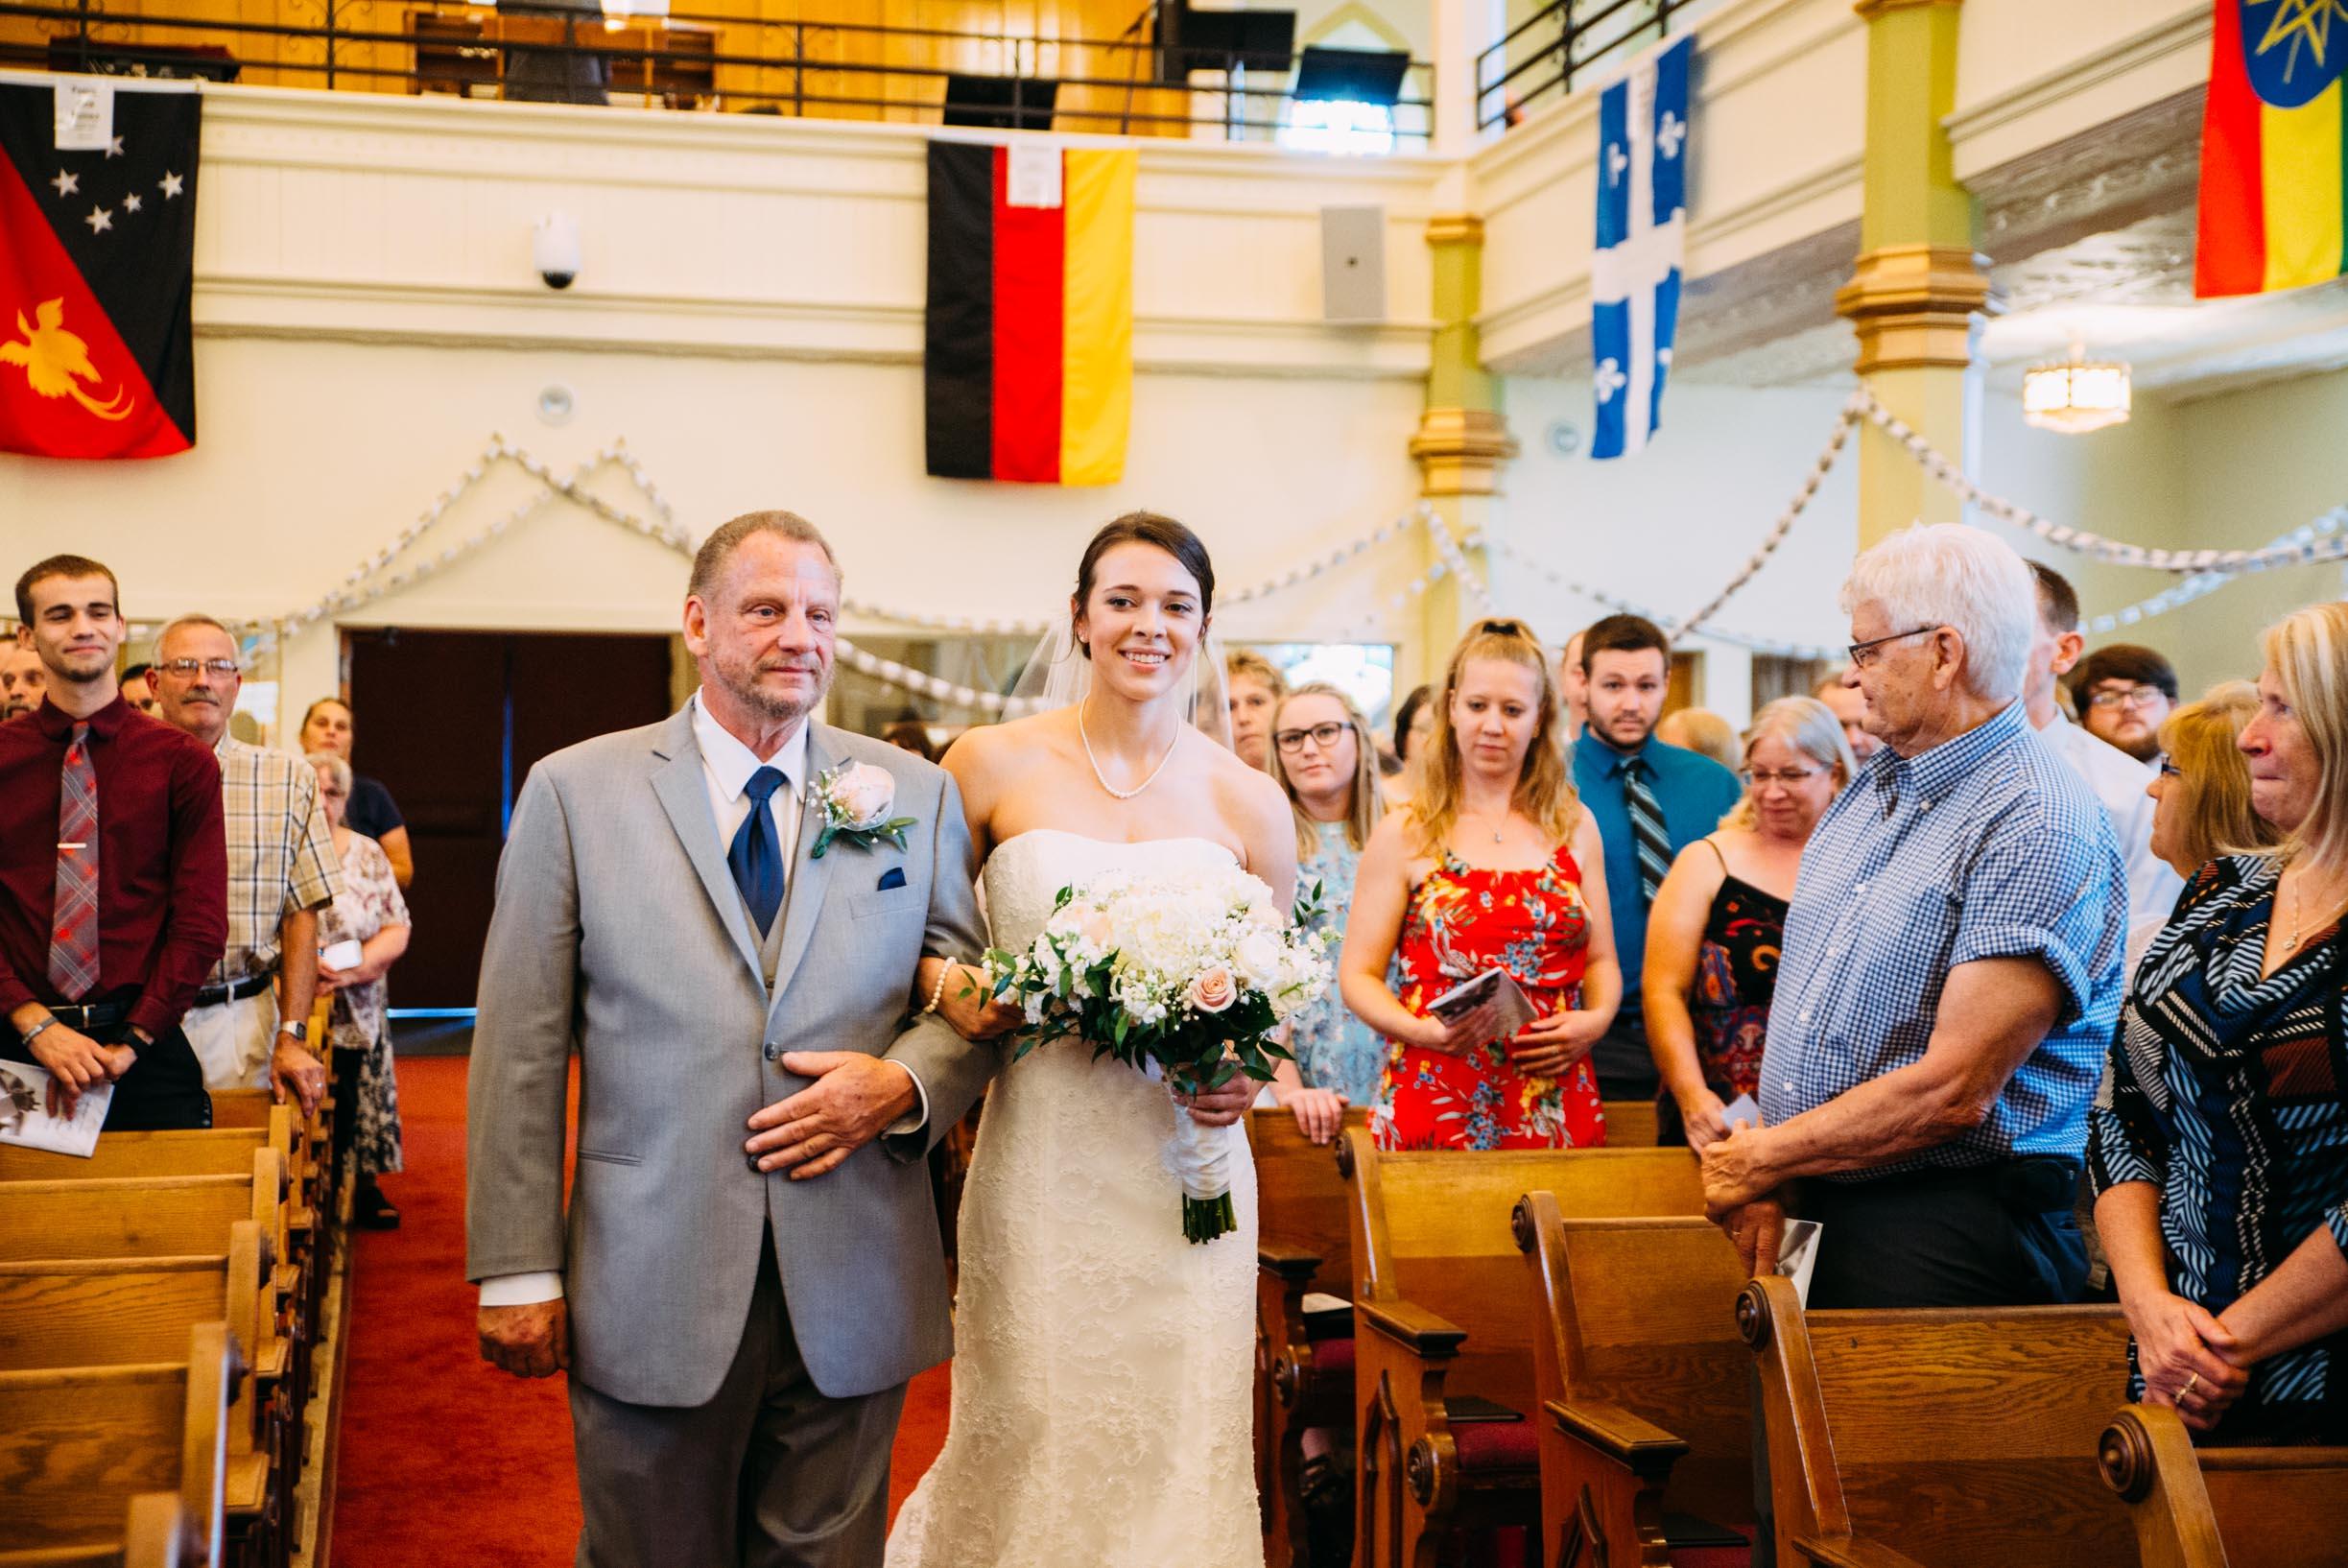 13-Lindsey Jake Wedding Winona St Martin's Lutheran Church.jpg